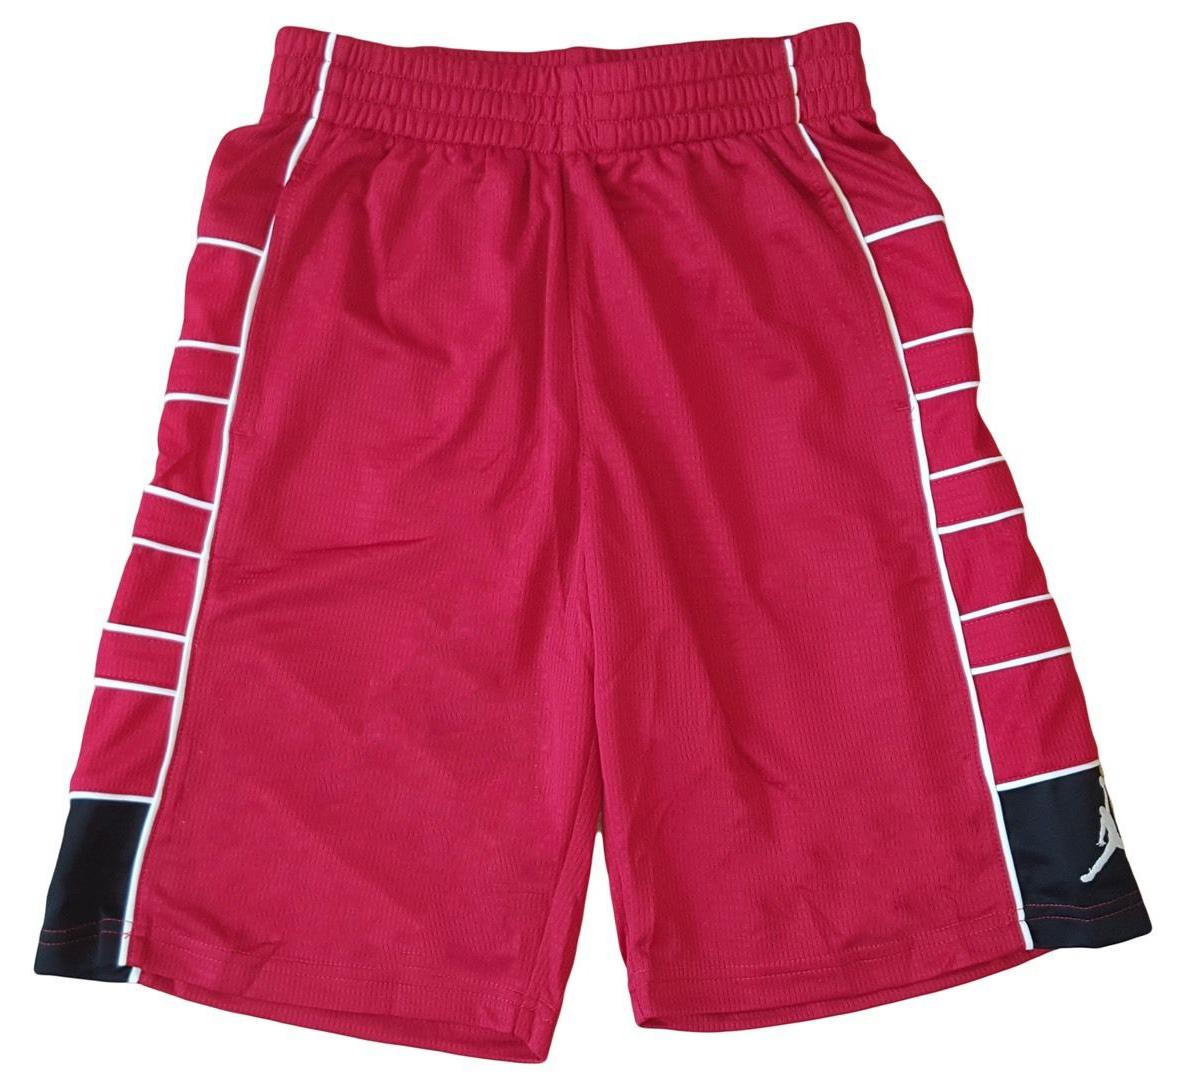 c6a898220205 Home   Children s Clothing   Nike Air Jordan Youth Boy s Gym Red Basketball  Shorts Size Medium 953148-R78